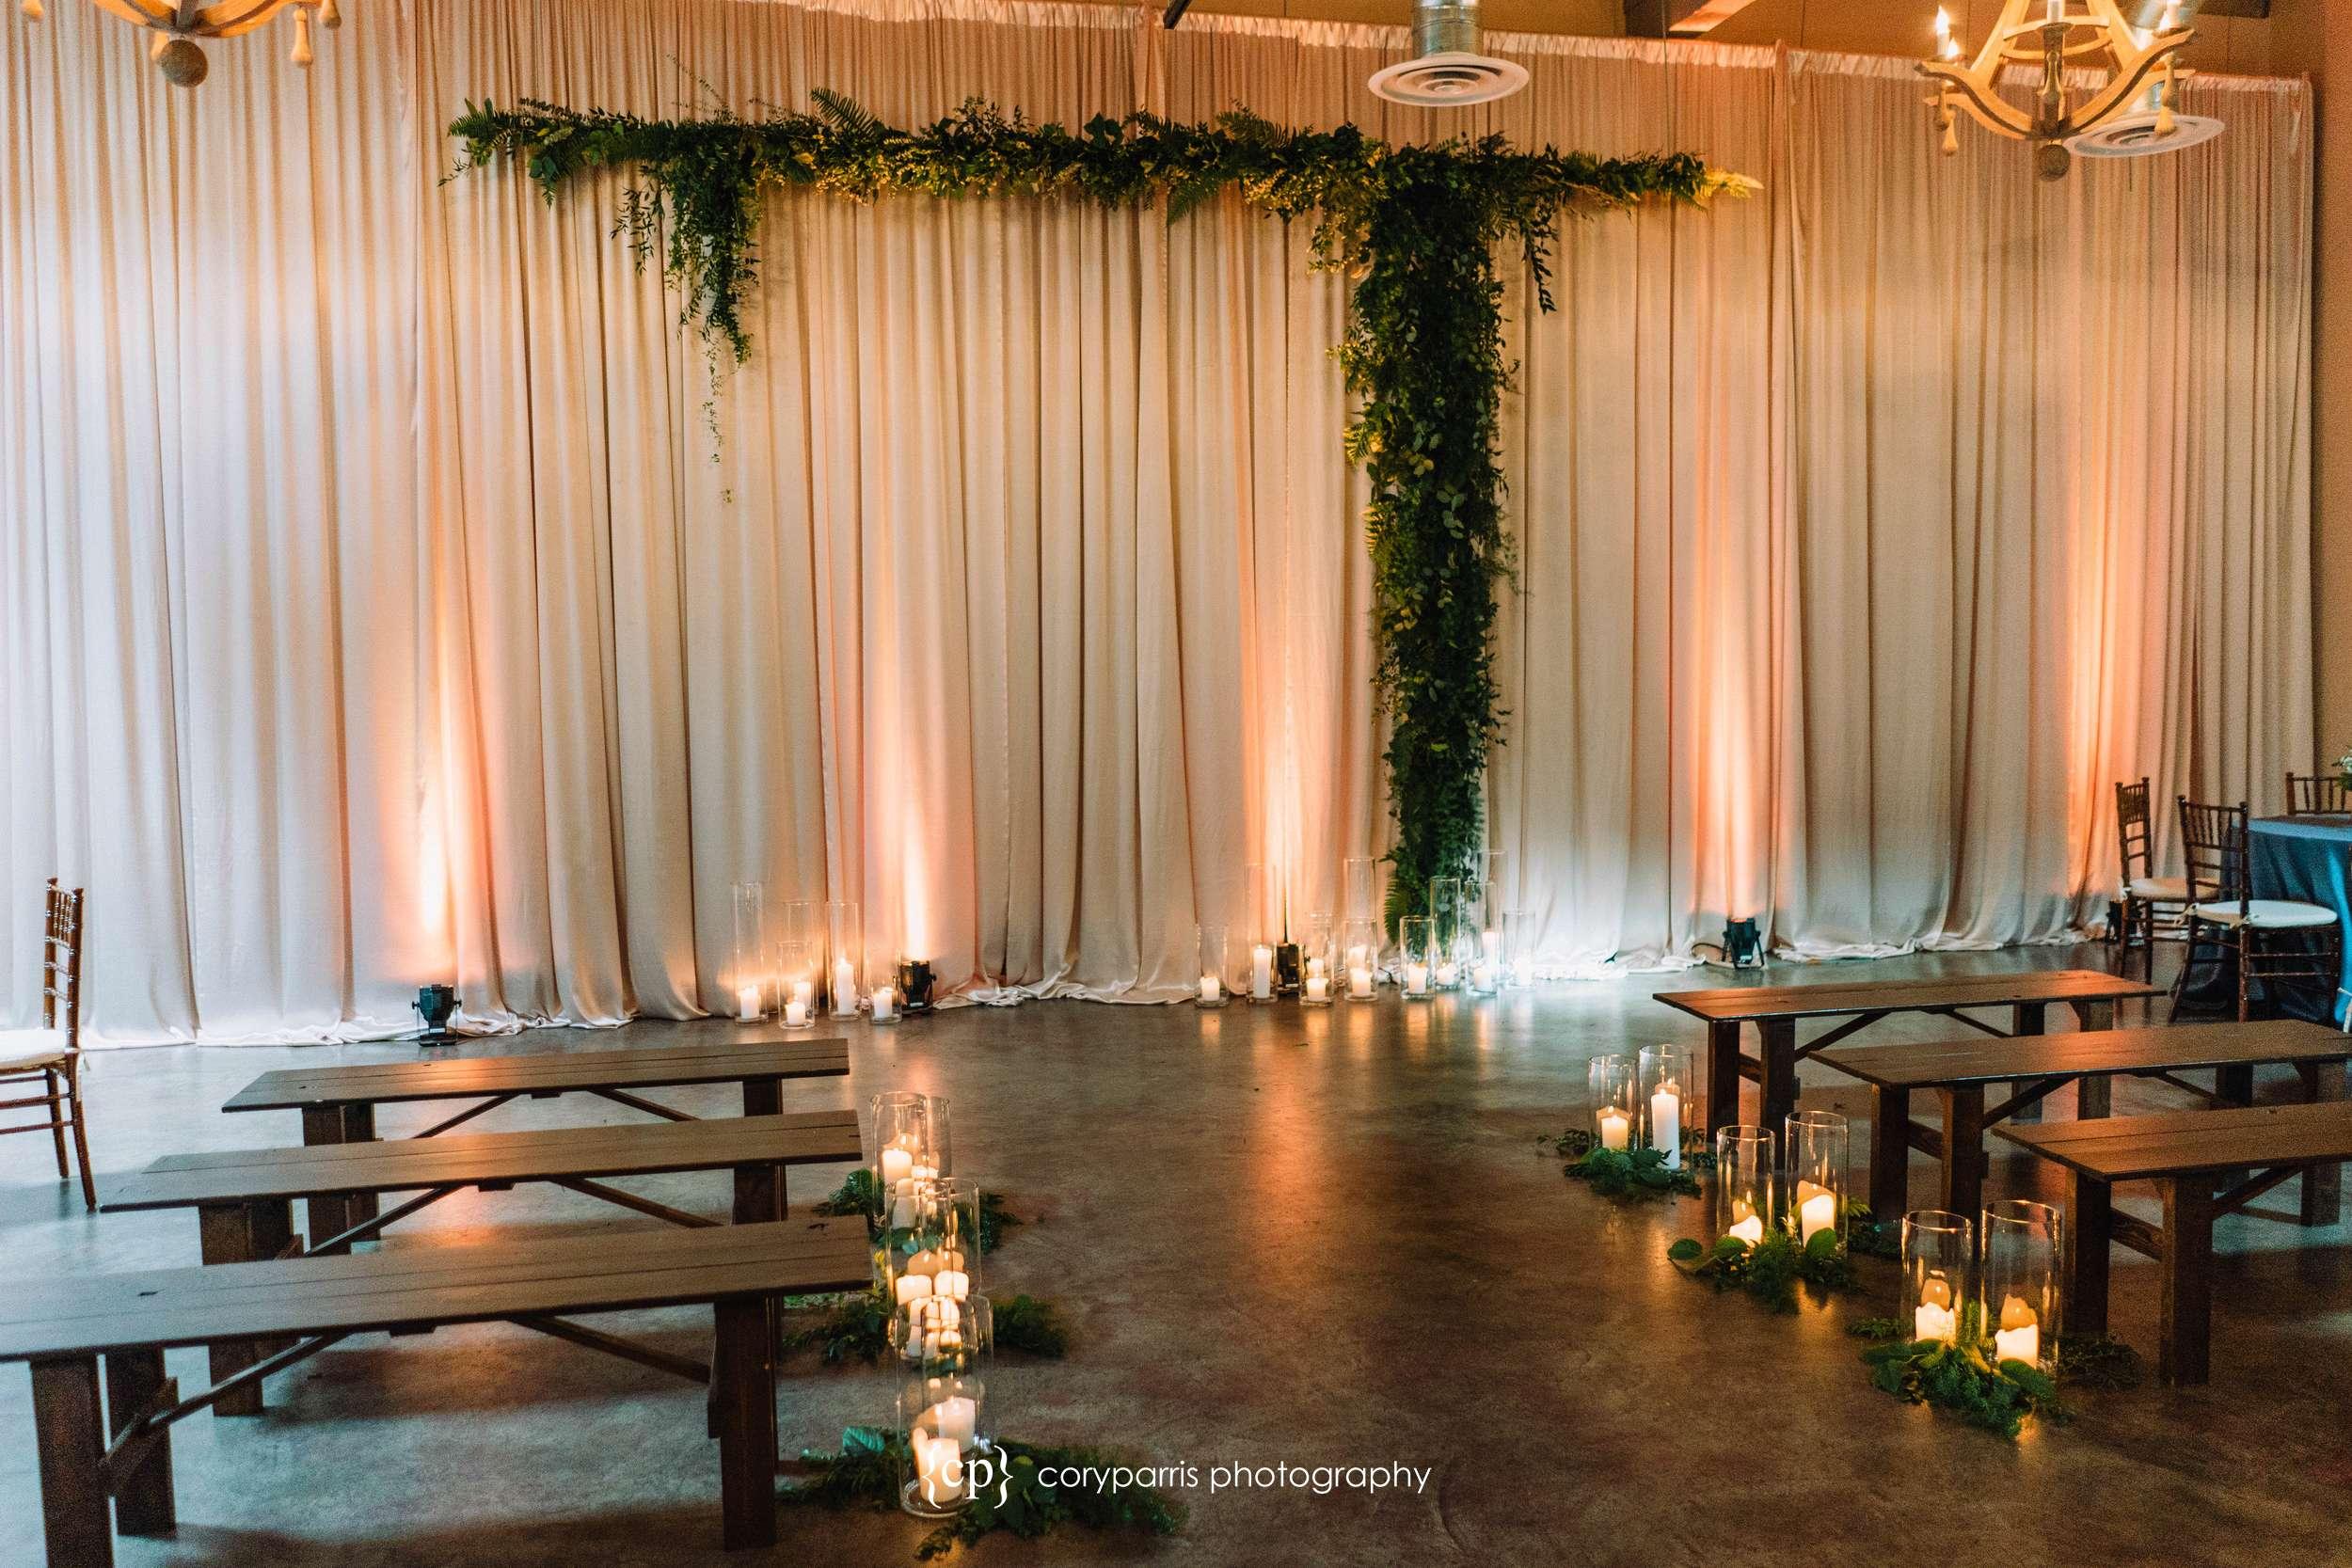 006-the-foundry-wedding-venue-seattle.jpg